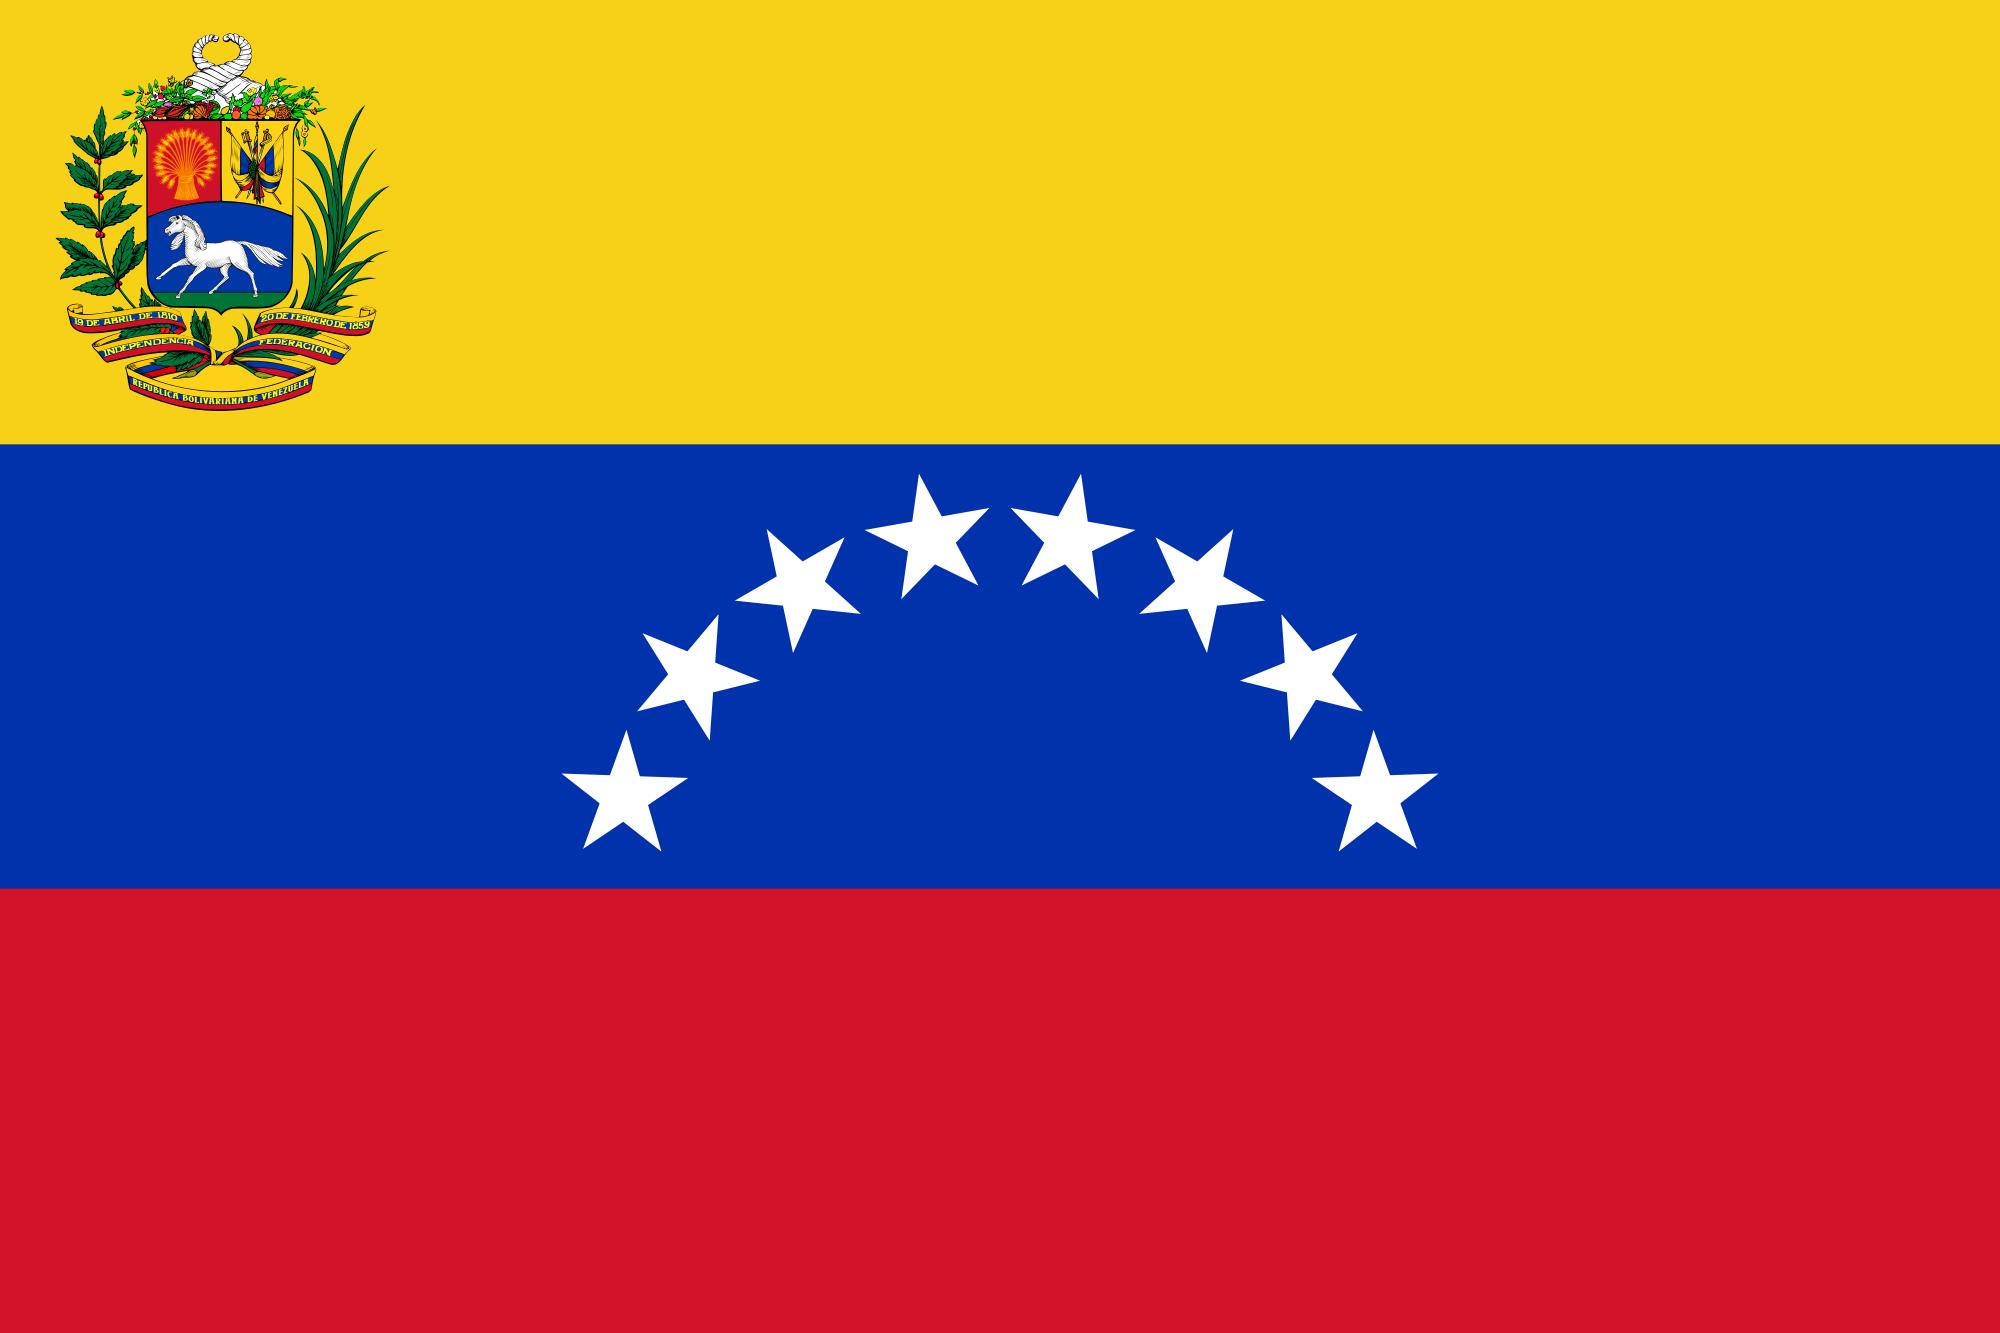 هلــ تعلم إلى ماذا ترمز Flag_of_Venezuela_(state).png